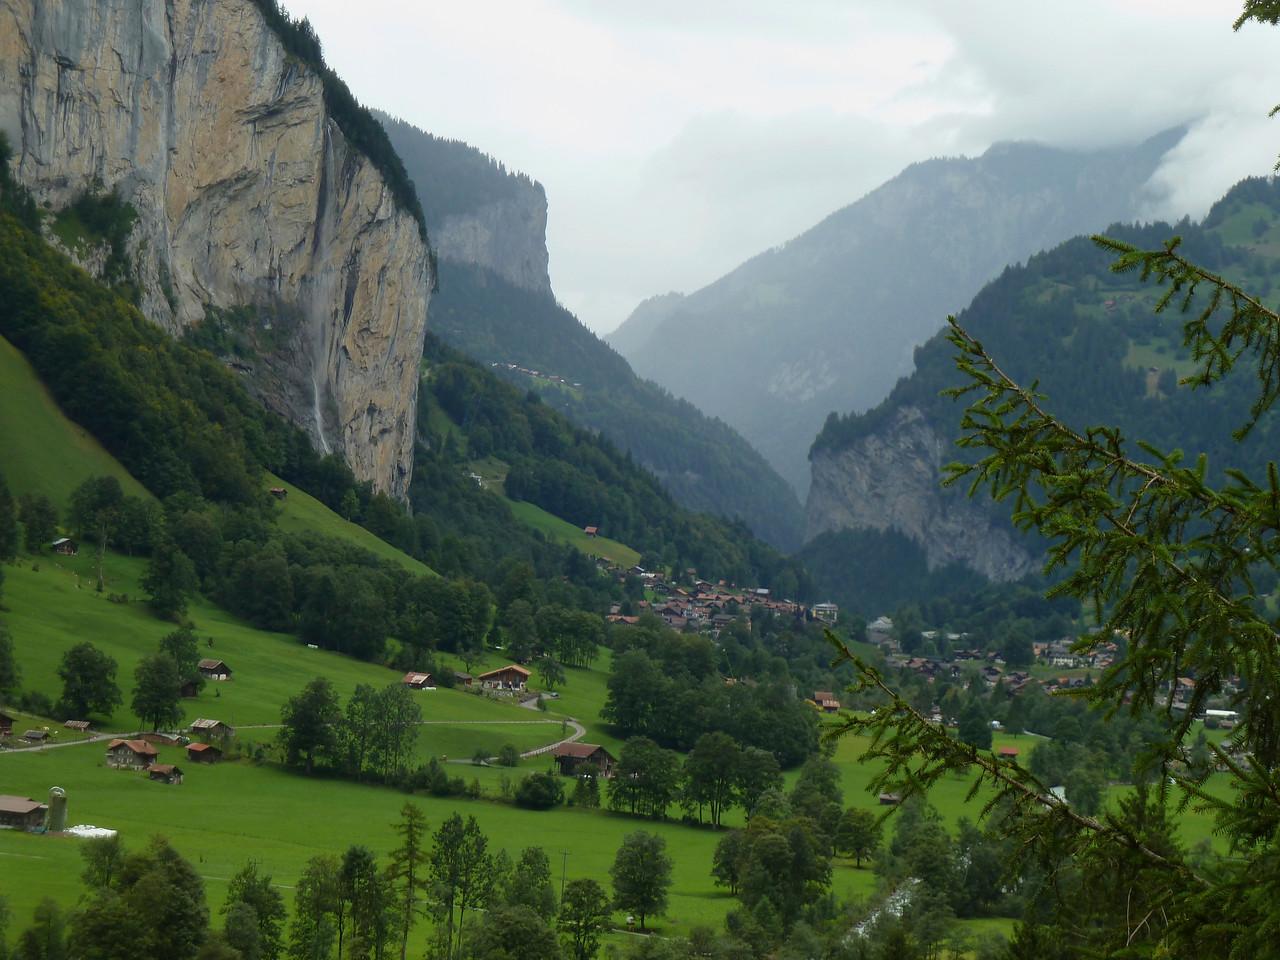 The Lauterbrunnen Valley.